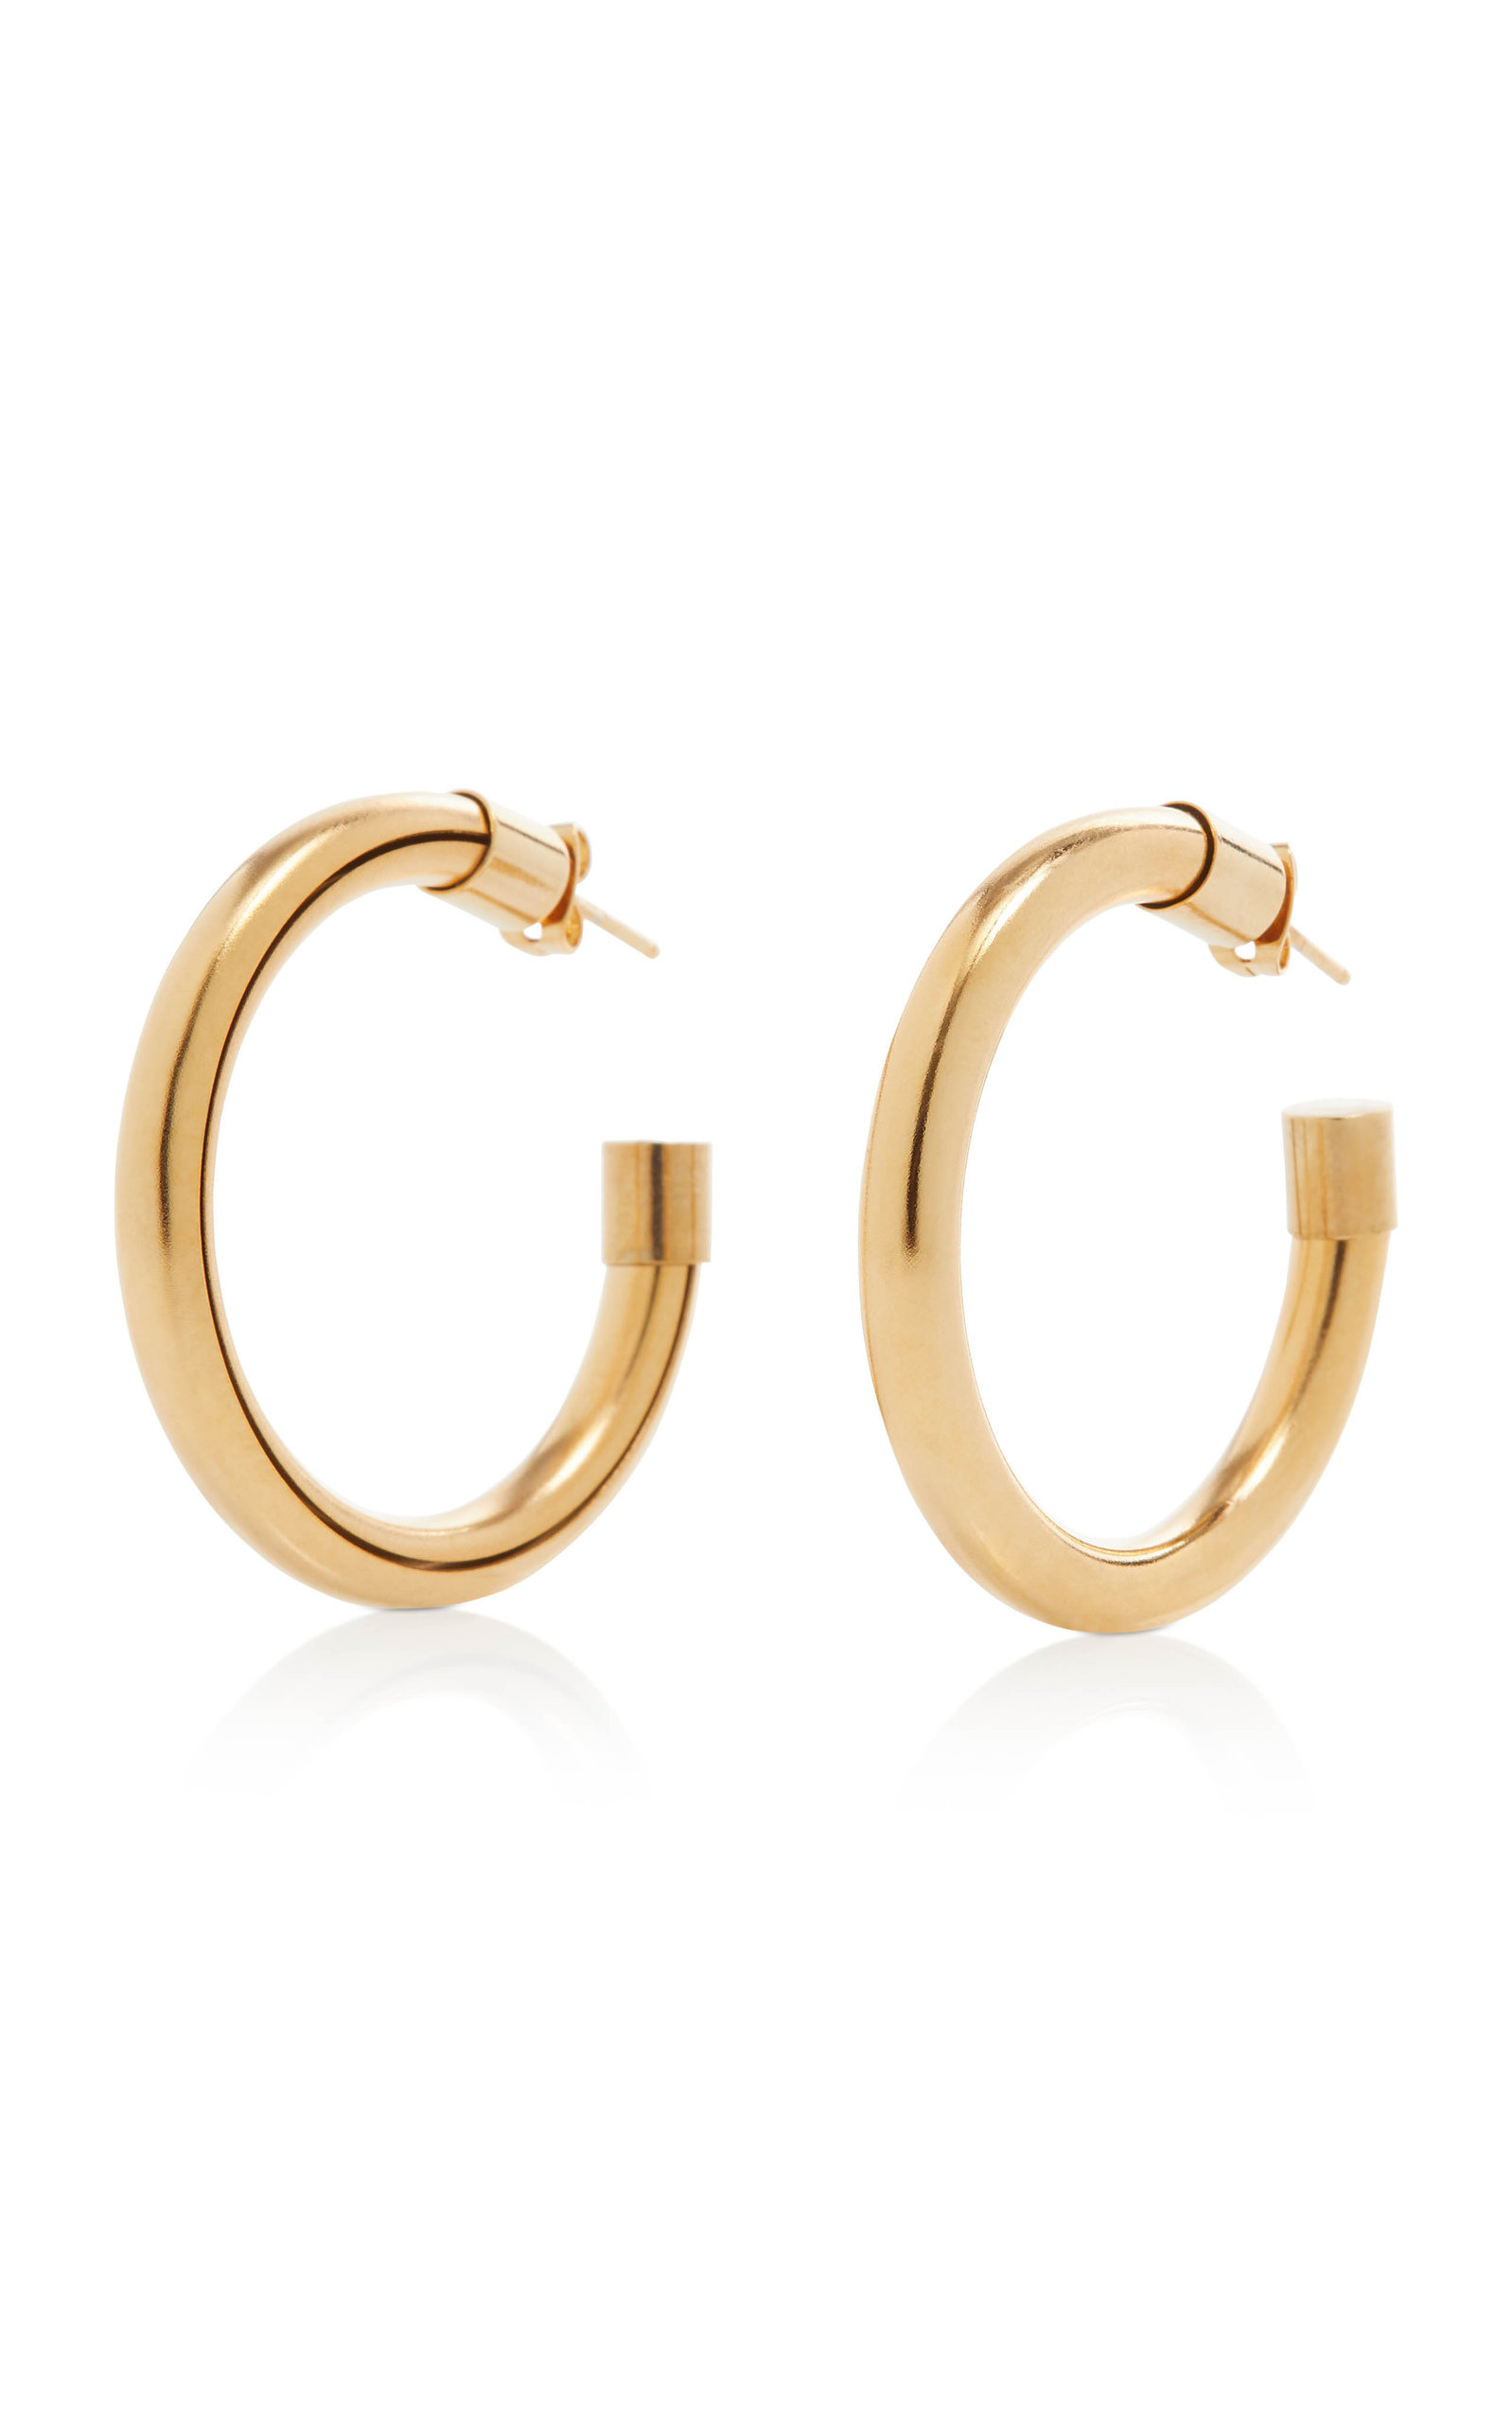 Women's Gold-Tone Metal Hoop Earrings